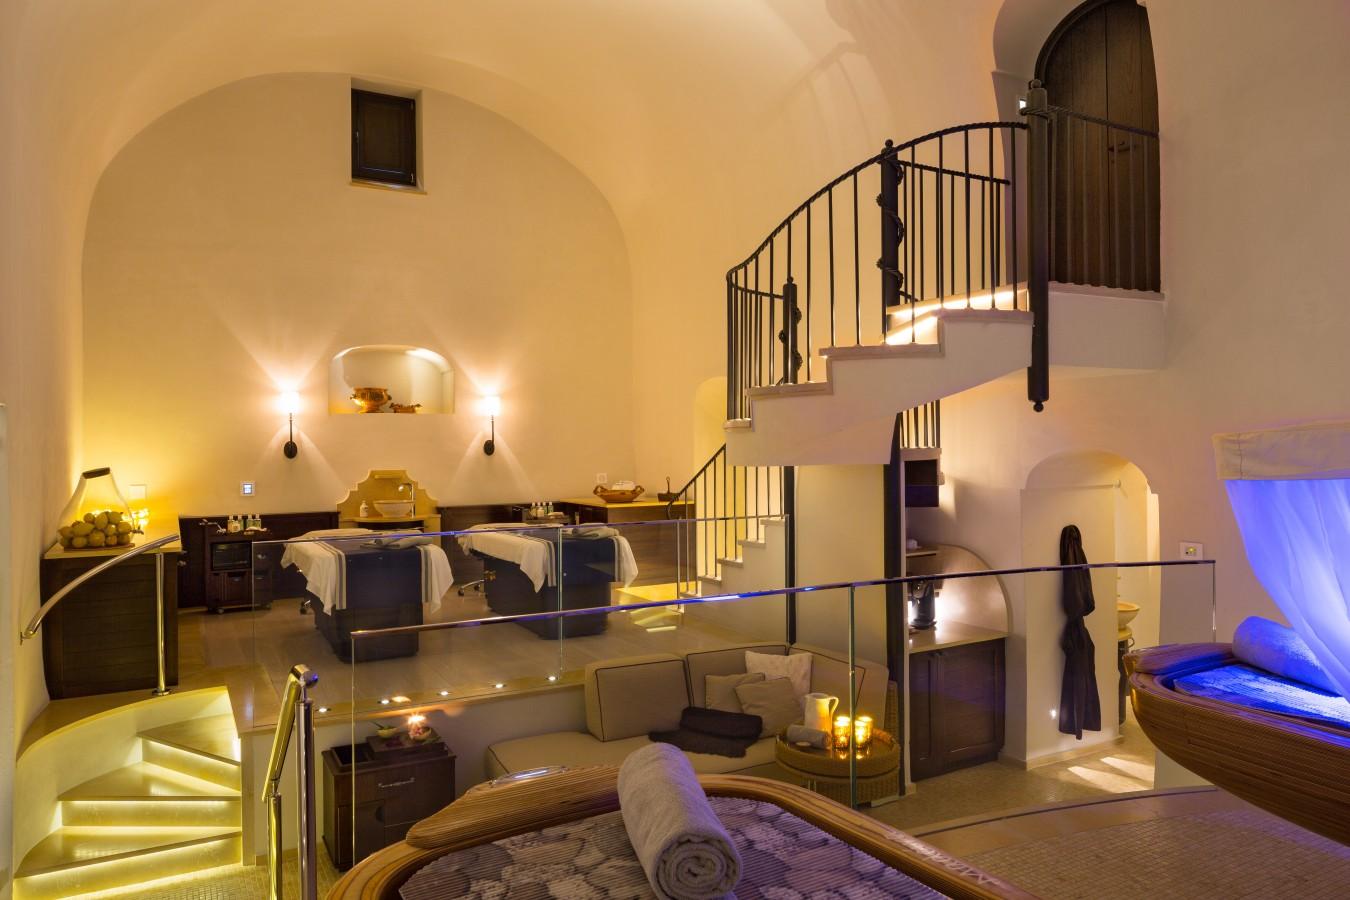 Monastero Santa Rosa Hotel & Spa - The Luxury Spa Edit